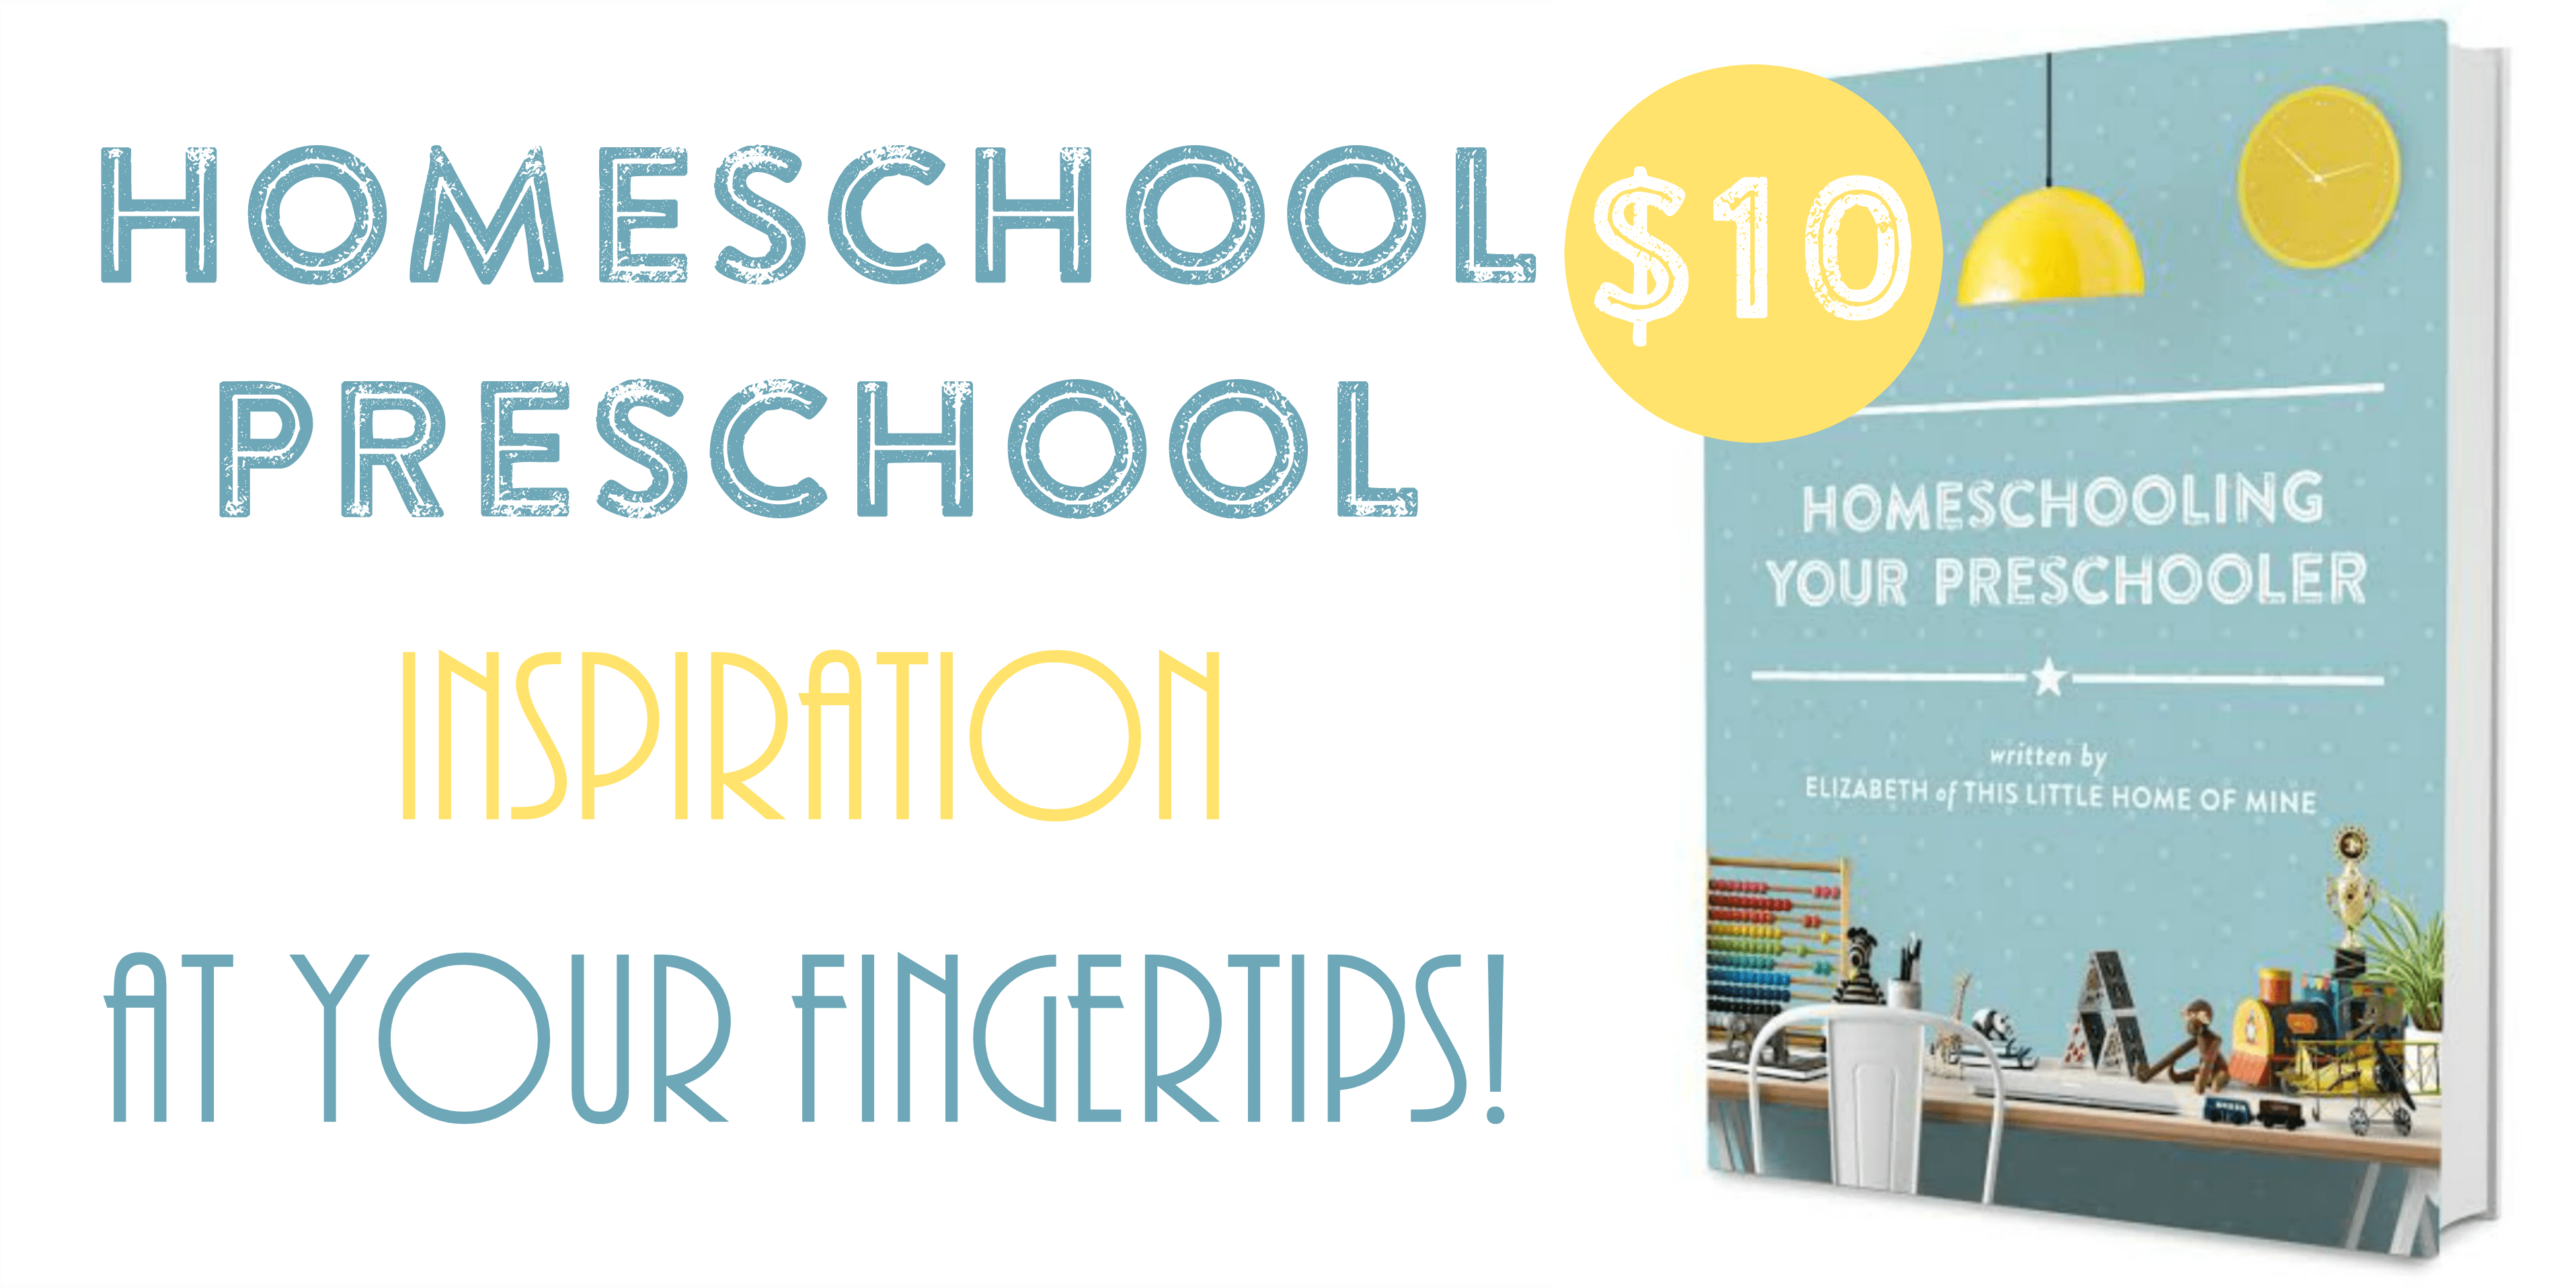 Three-Year Old Homeschool Preschool | Activities, Homeschool and ...